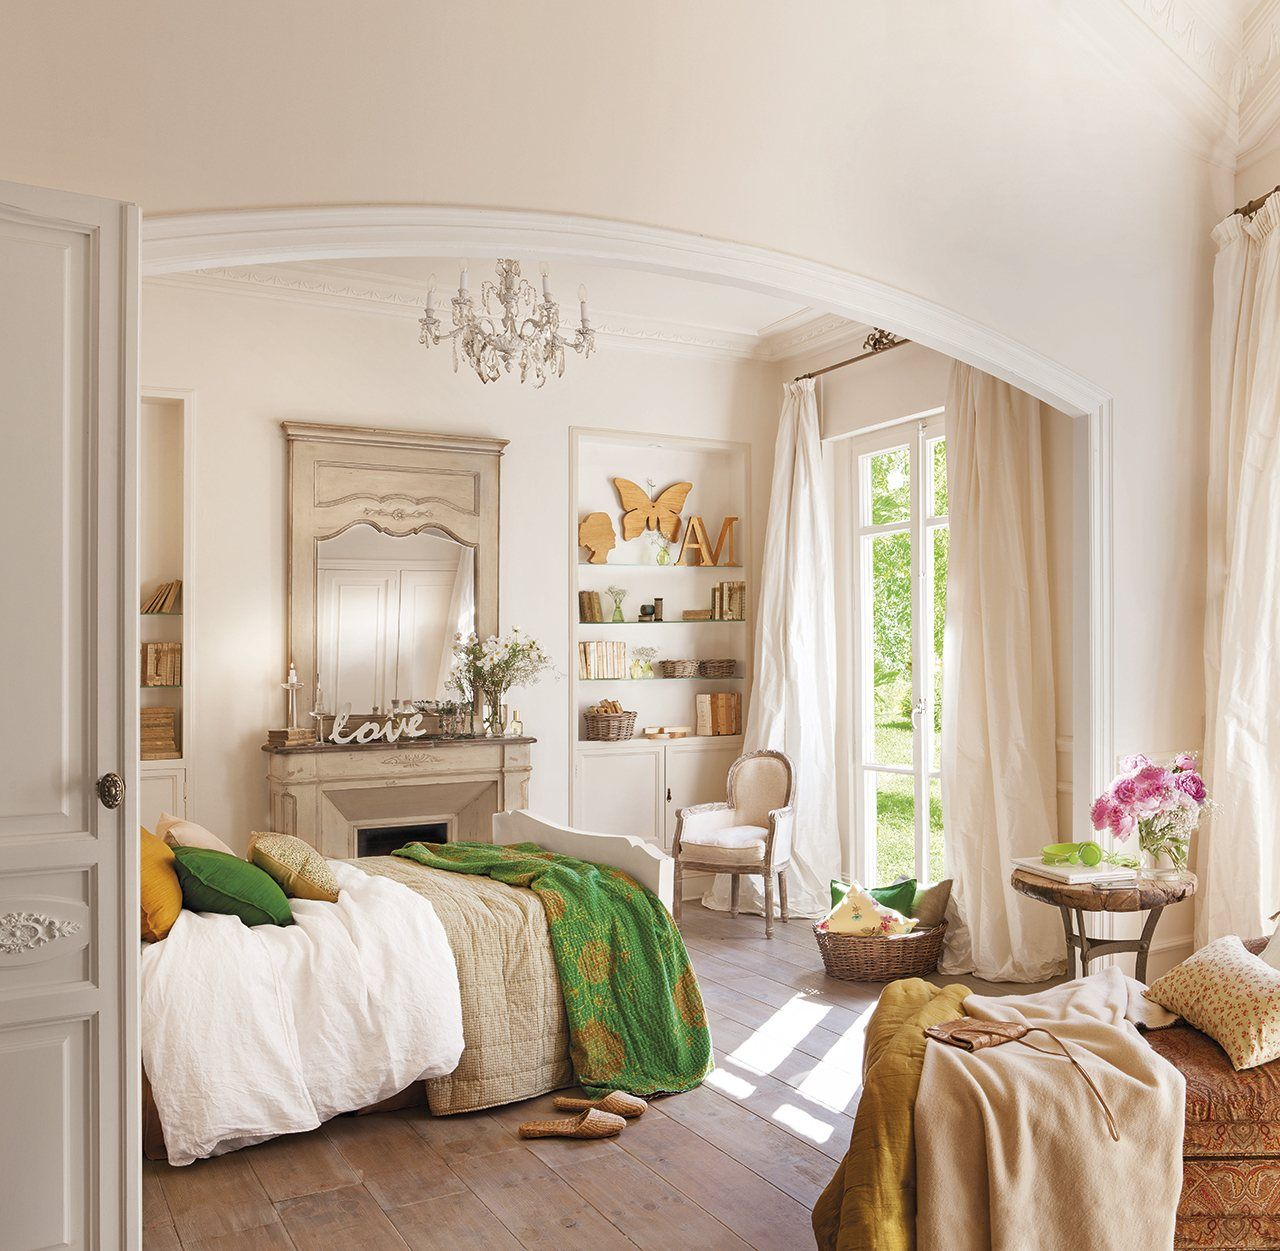 10 dormitorios de ensue o dormitorio de ensue o for Decoracion dormitorios clasicos